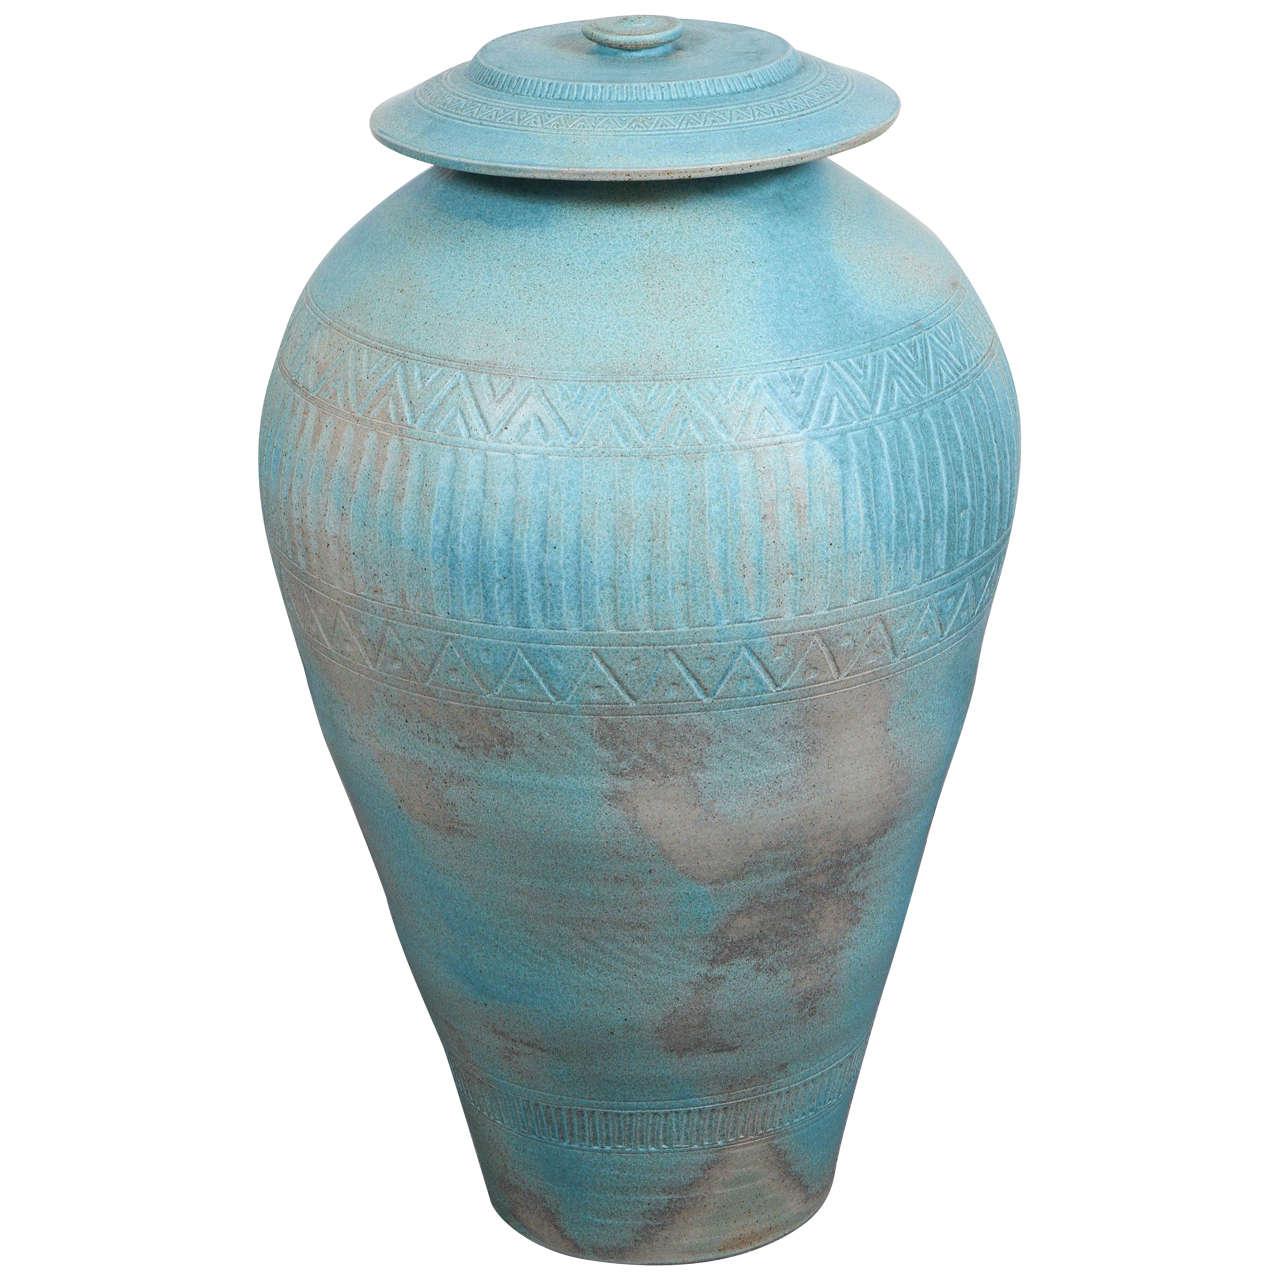 Monumental Lidded Amphora Style Ceramic Vessel, Custom for Steve Chase For Sale